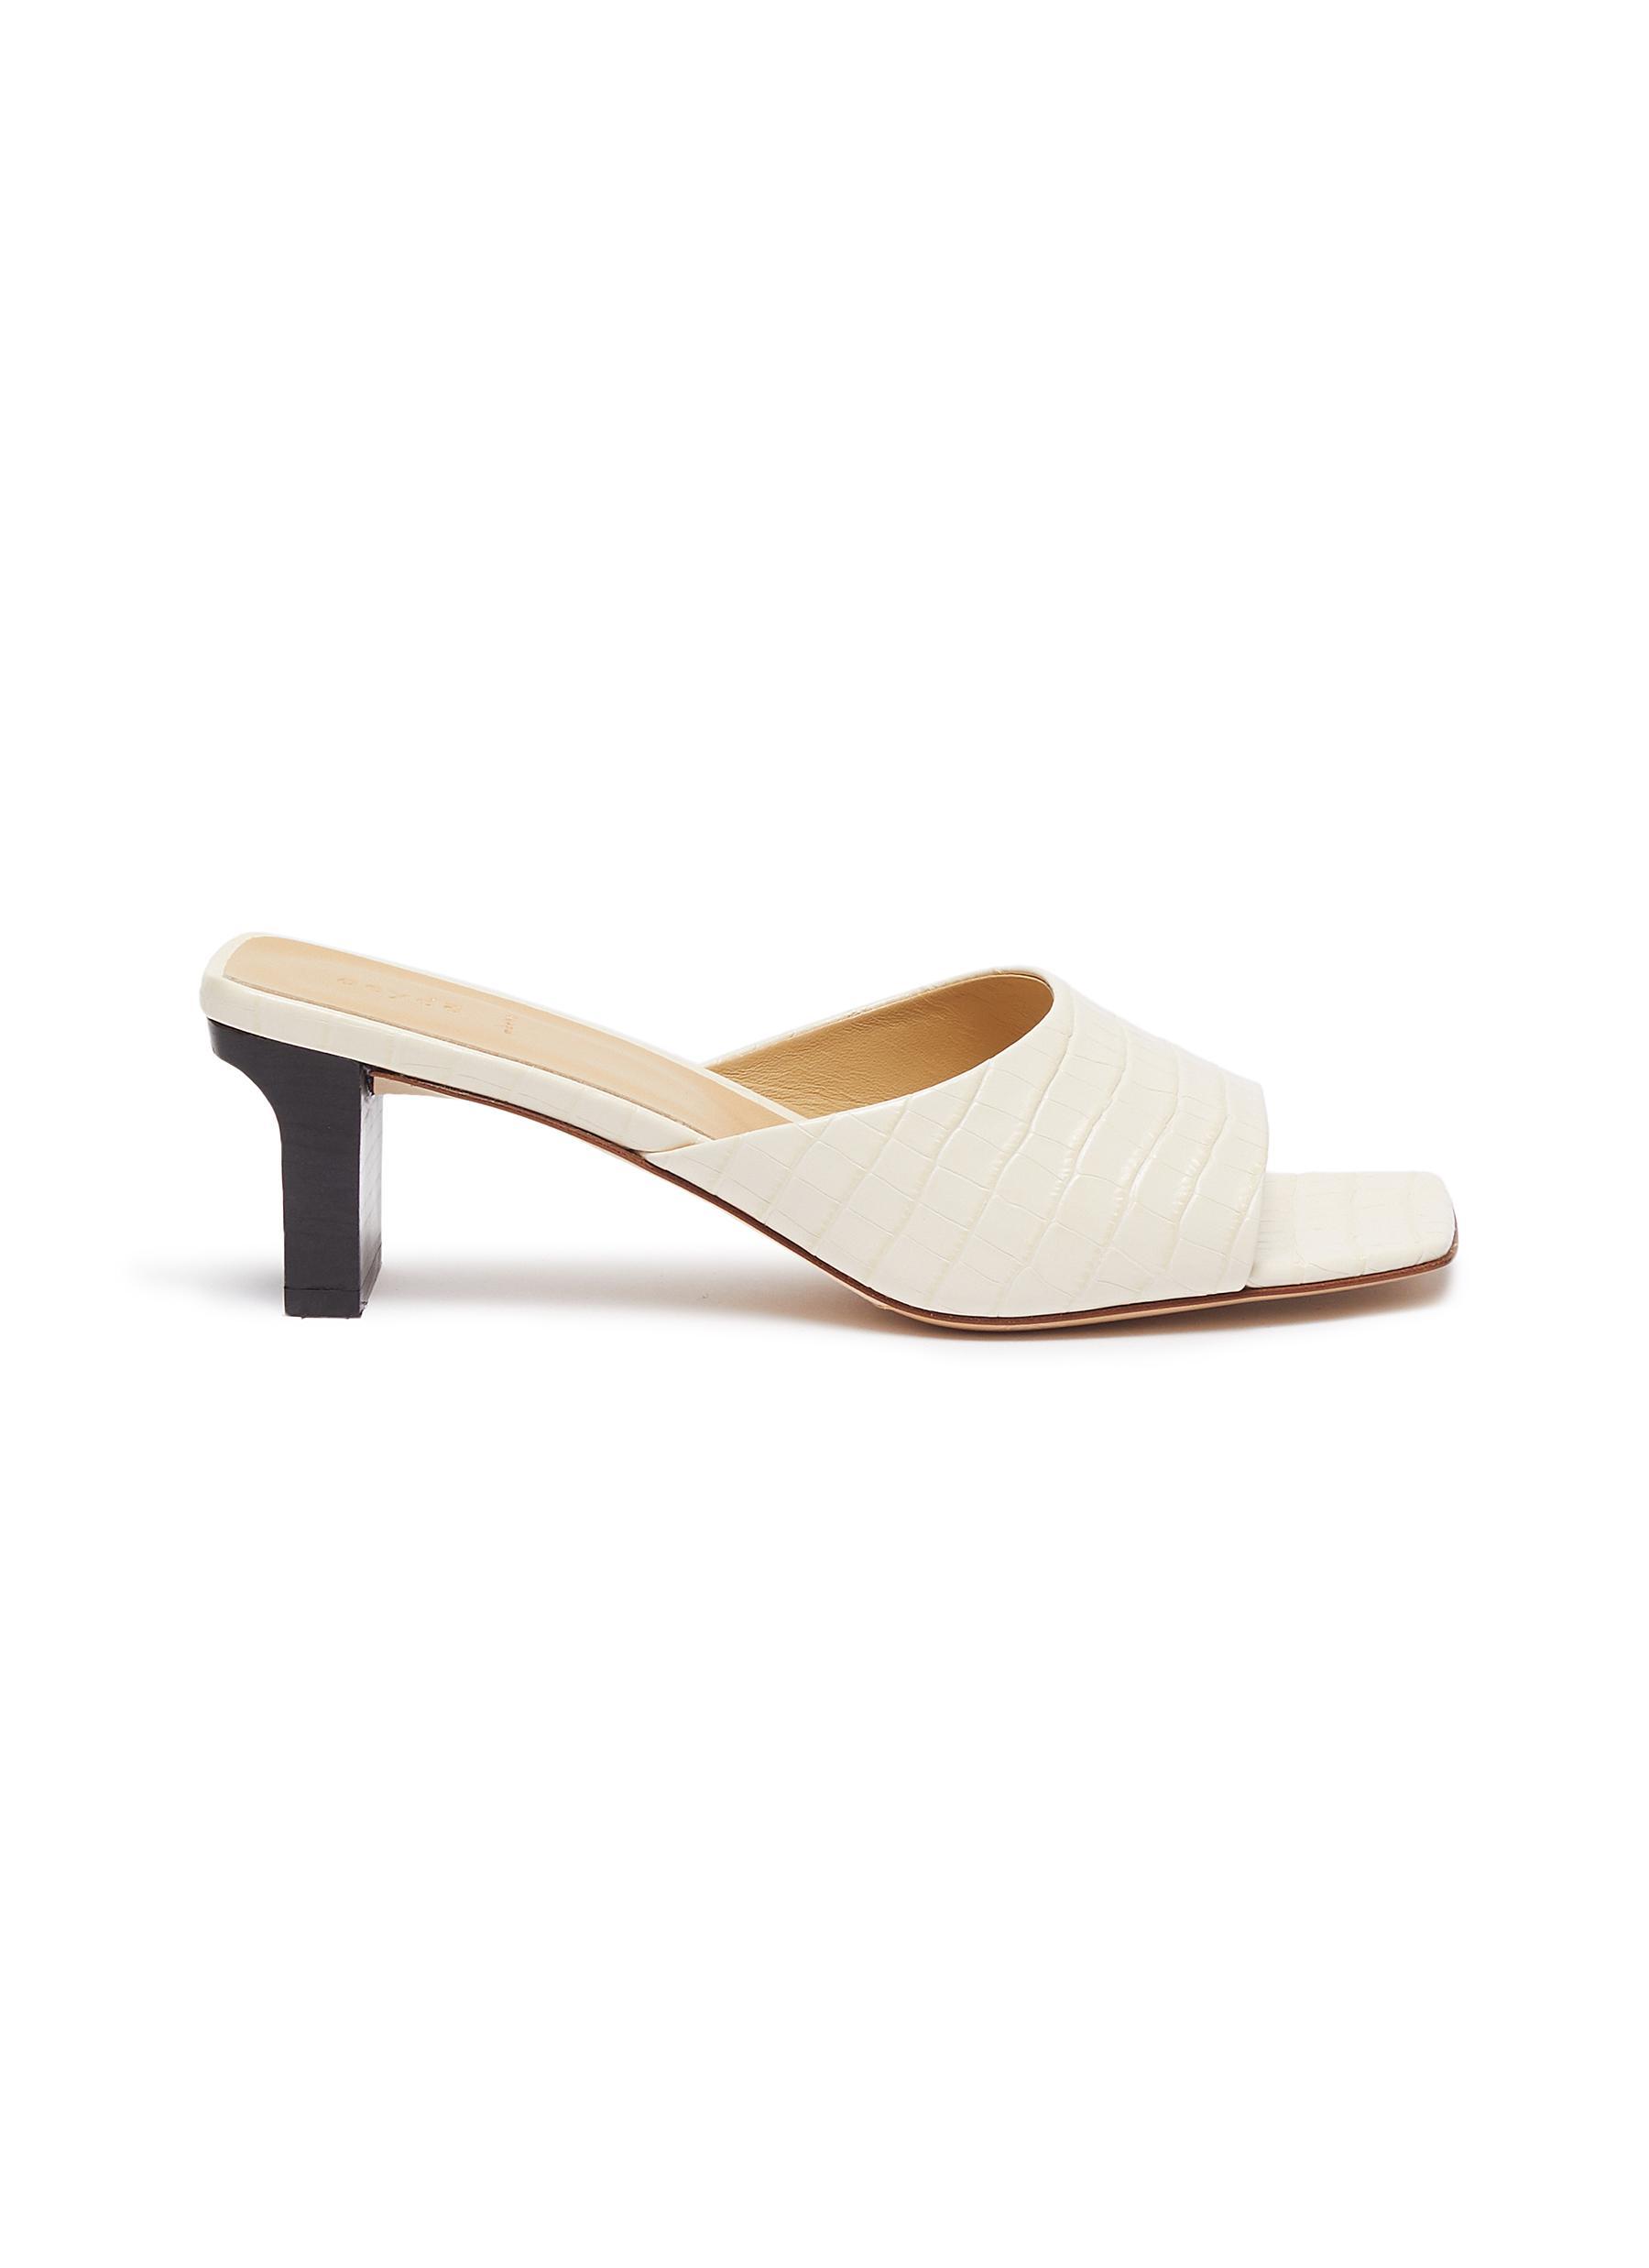 Aeyde 'Katti' single band croc embossed leather sandals